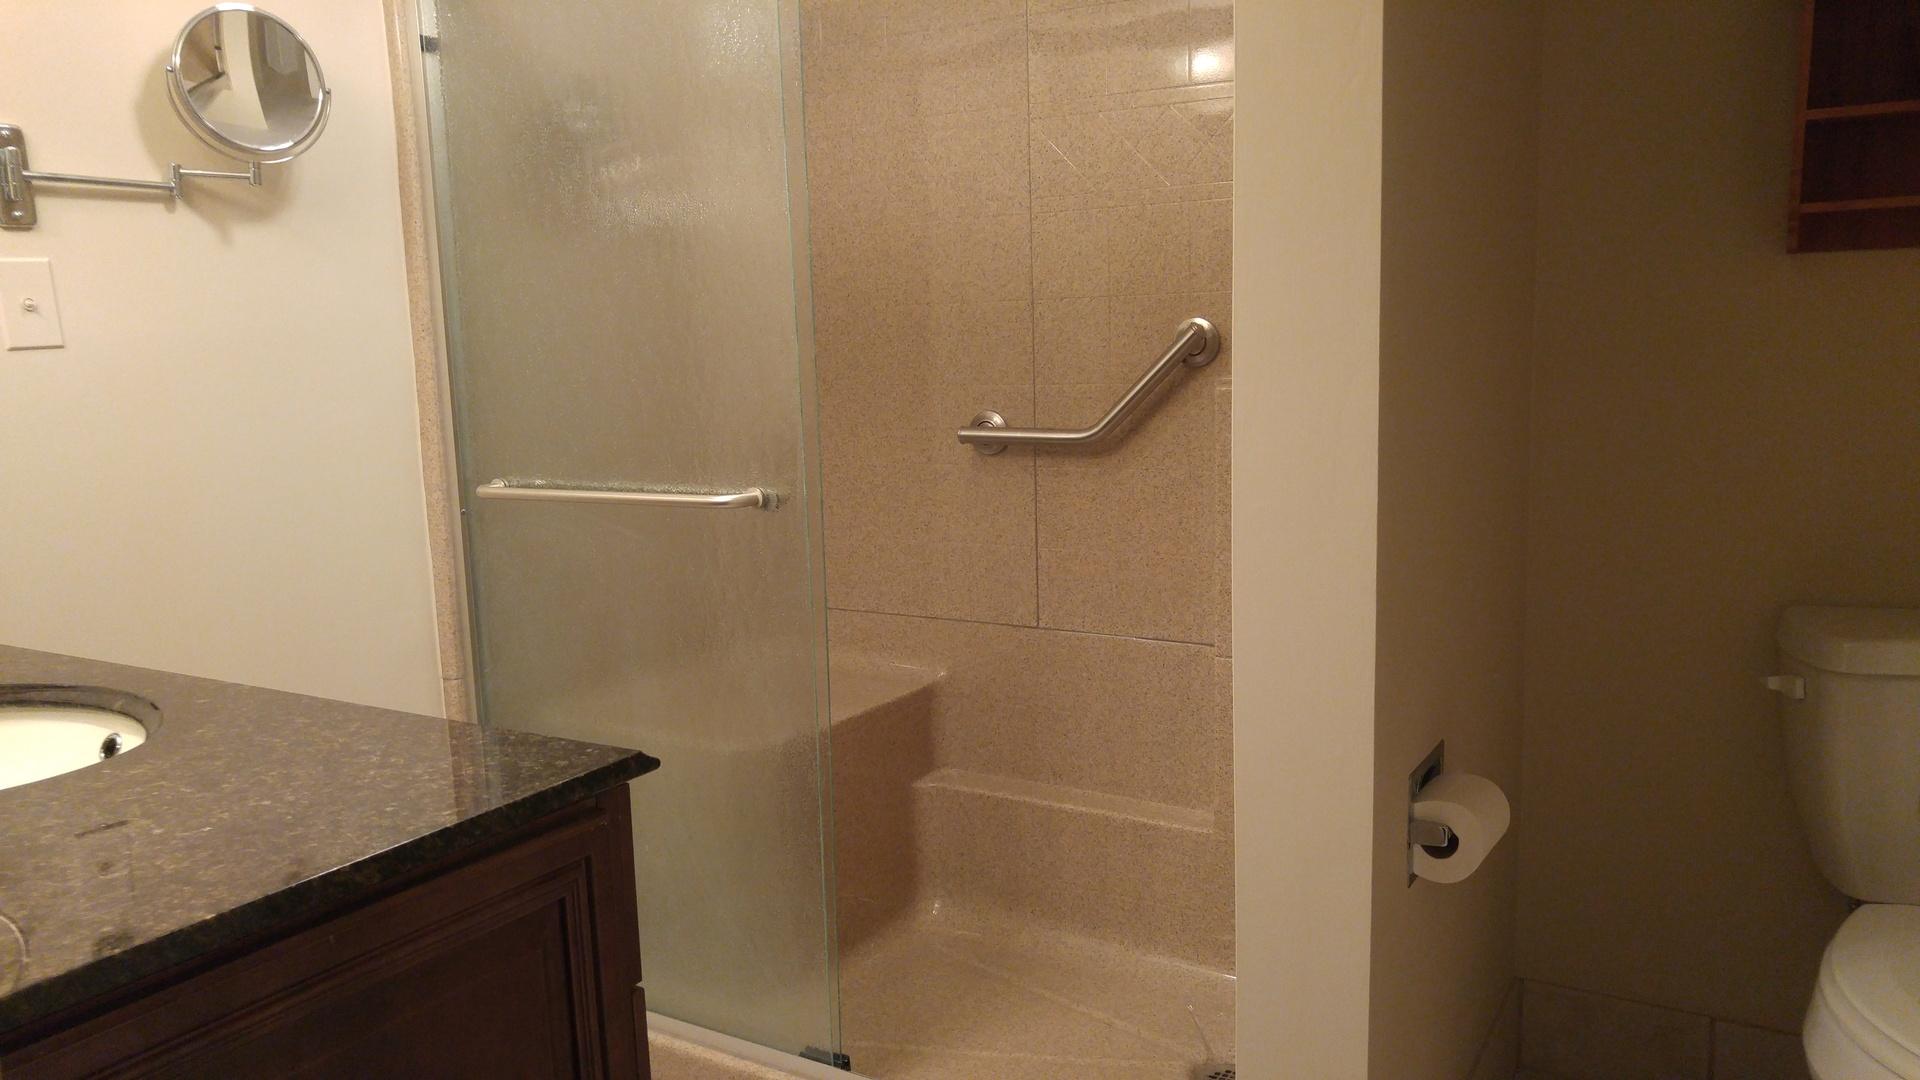 Shower, Shower Doors and Grab Bar Install